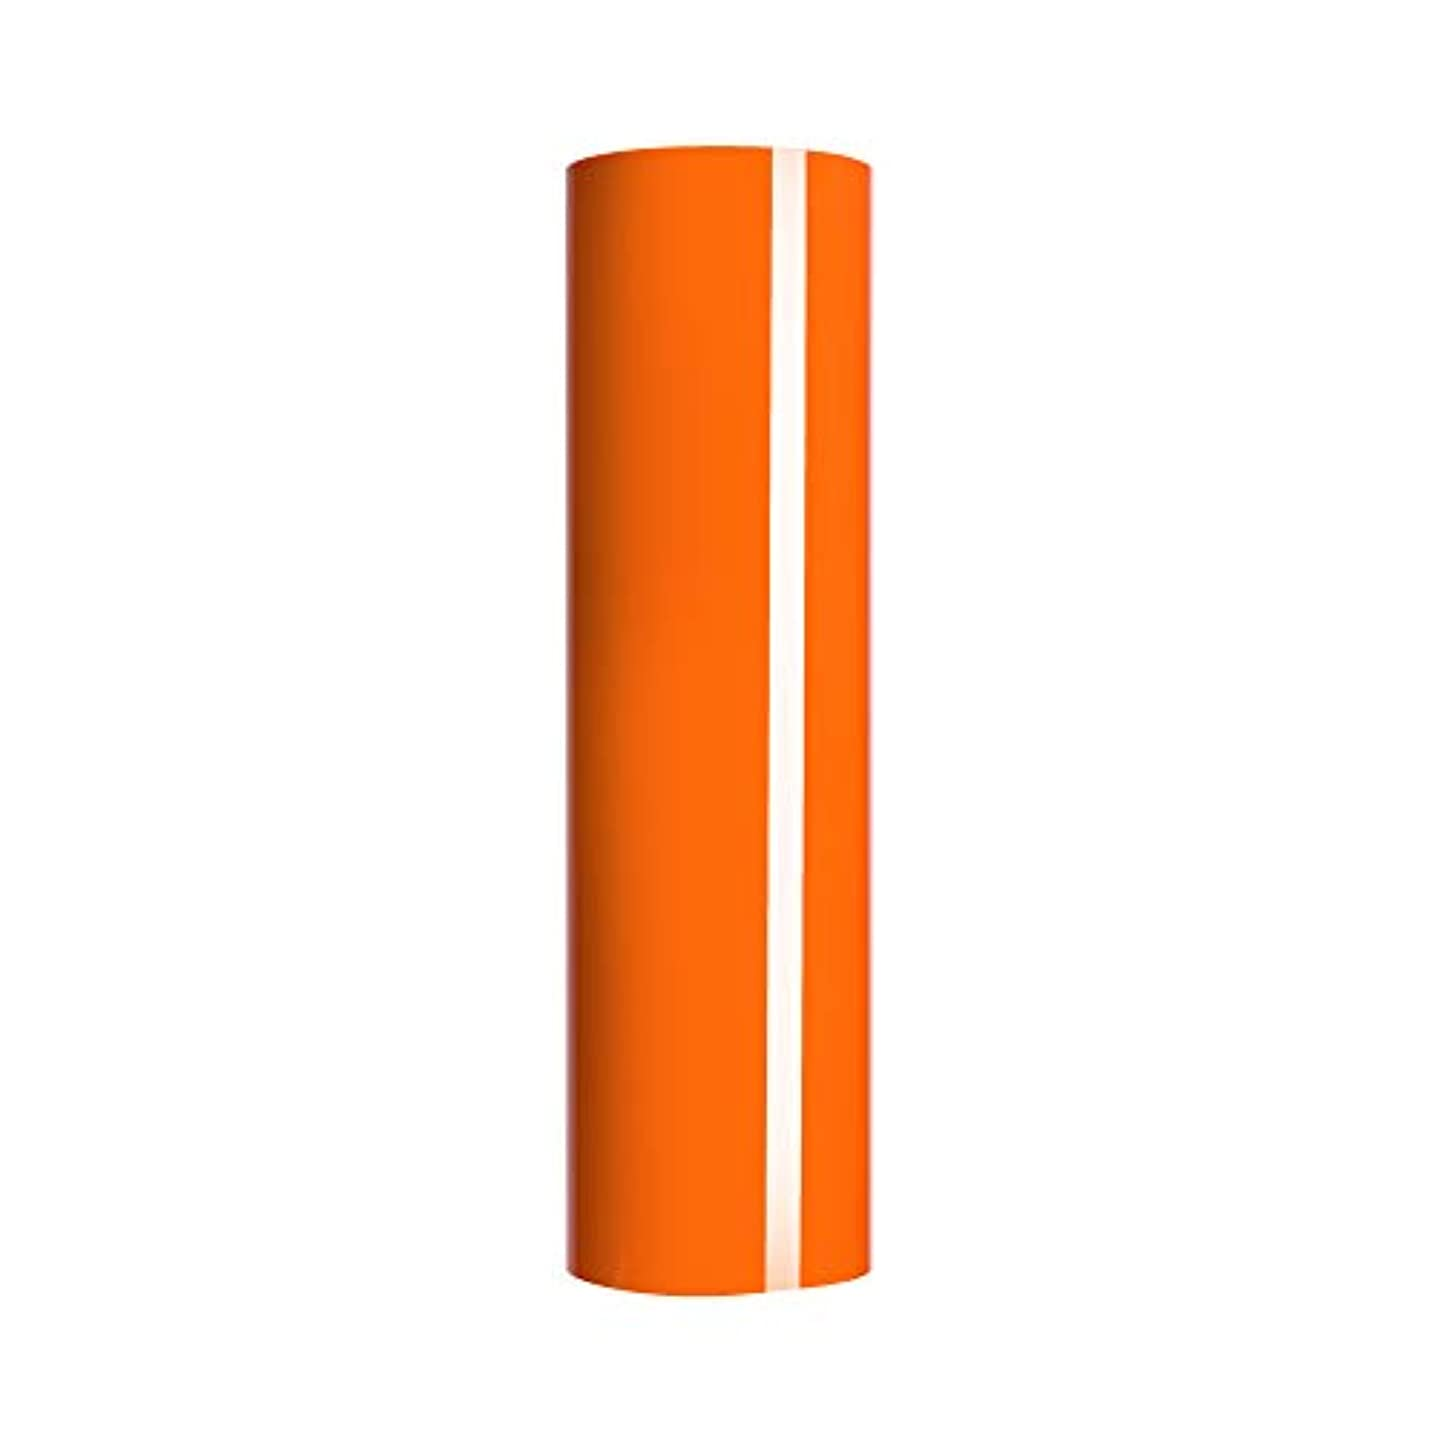 Orange Heat Transfer Vinyl,PU HTV Iron-on Vinyl Heat Transfer Vinyl Roll for T-Shirts 、Idea Fabrics or Heat Press Machine 0.8x5ft (Orange)